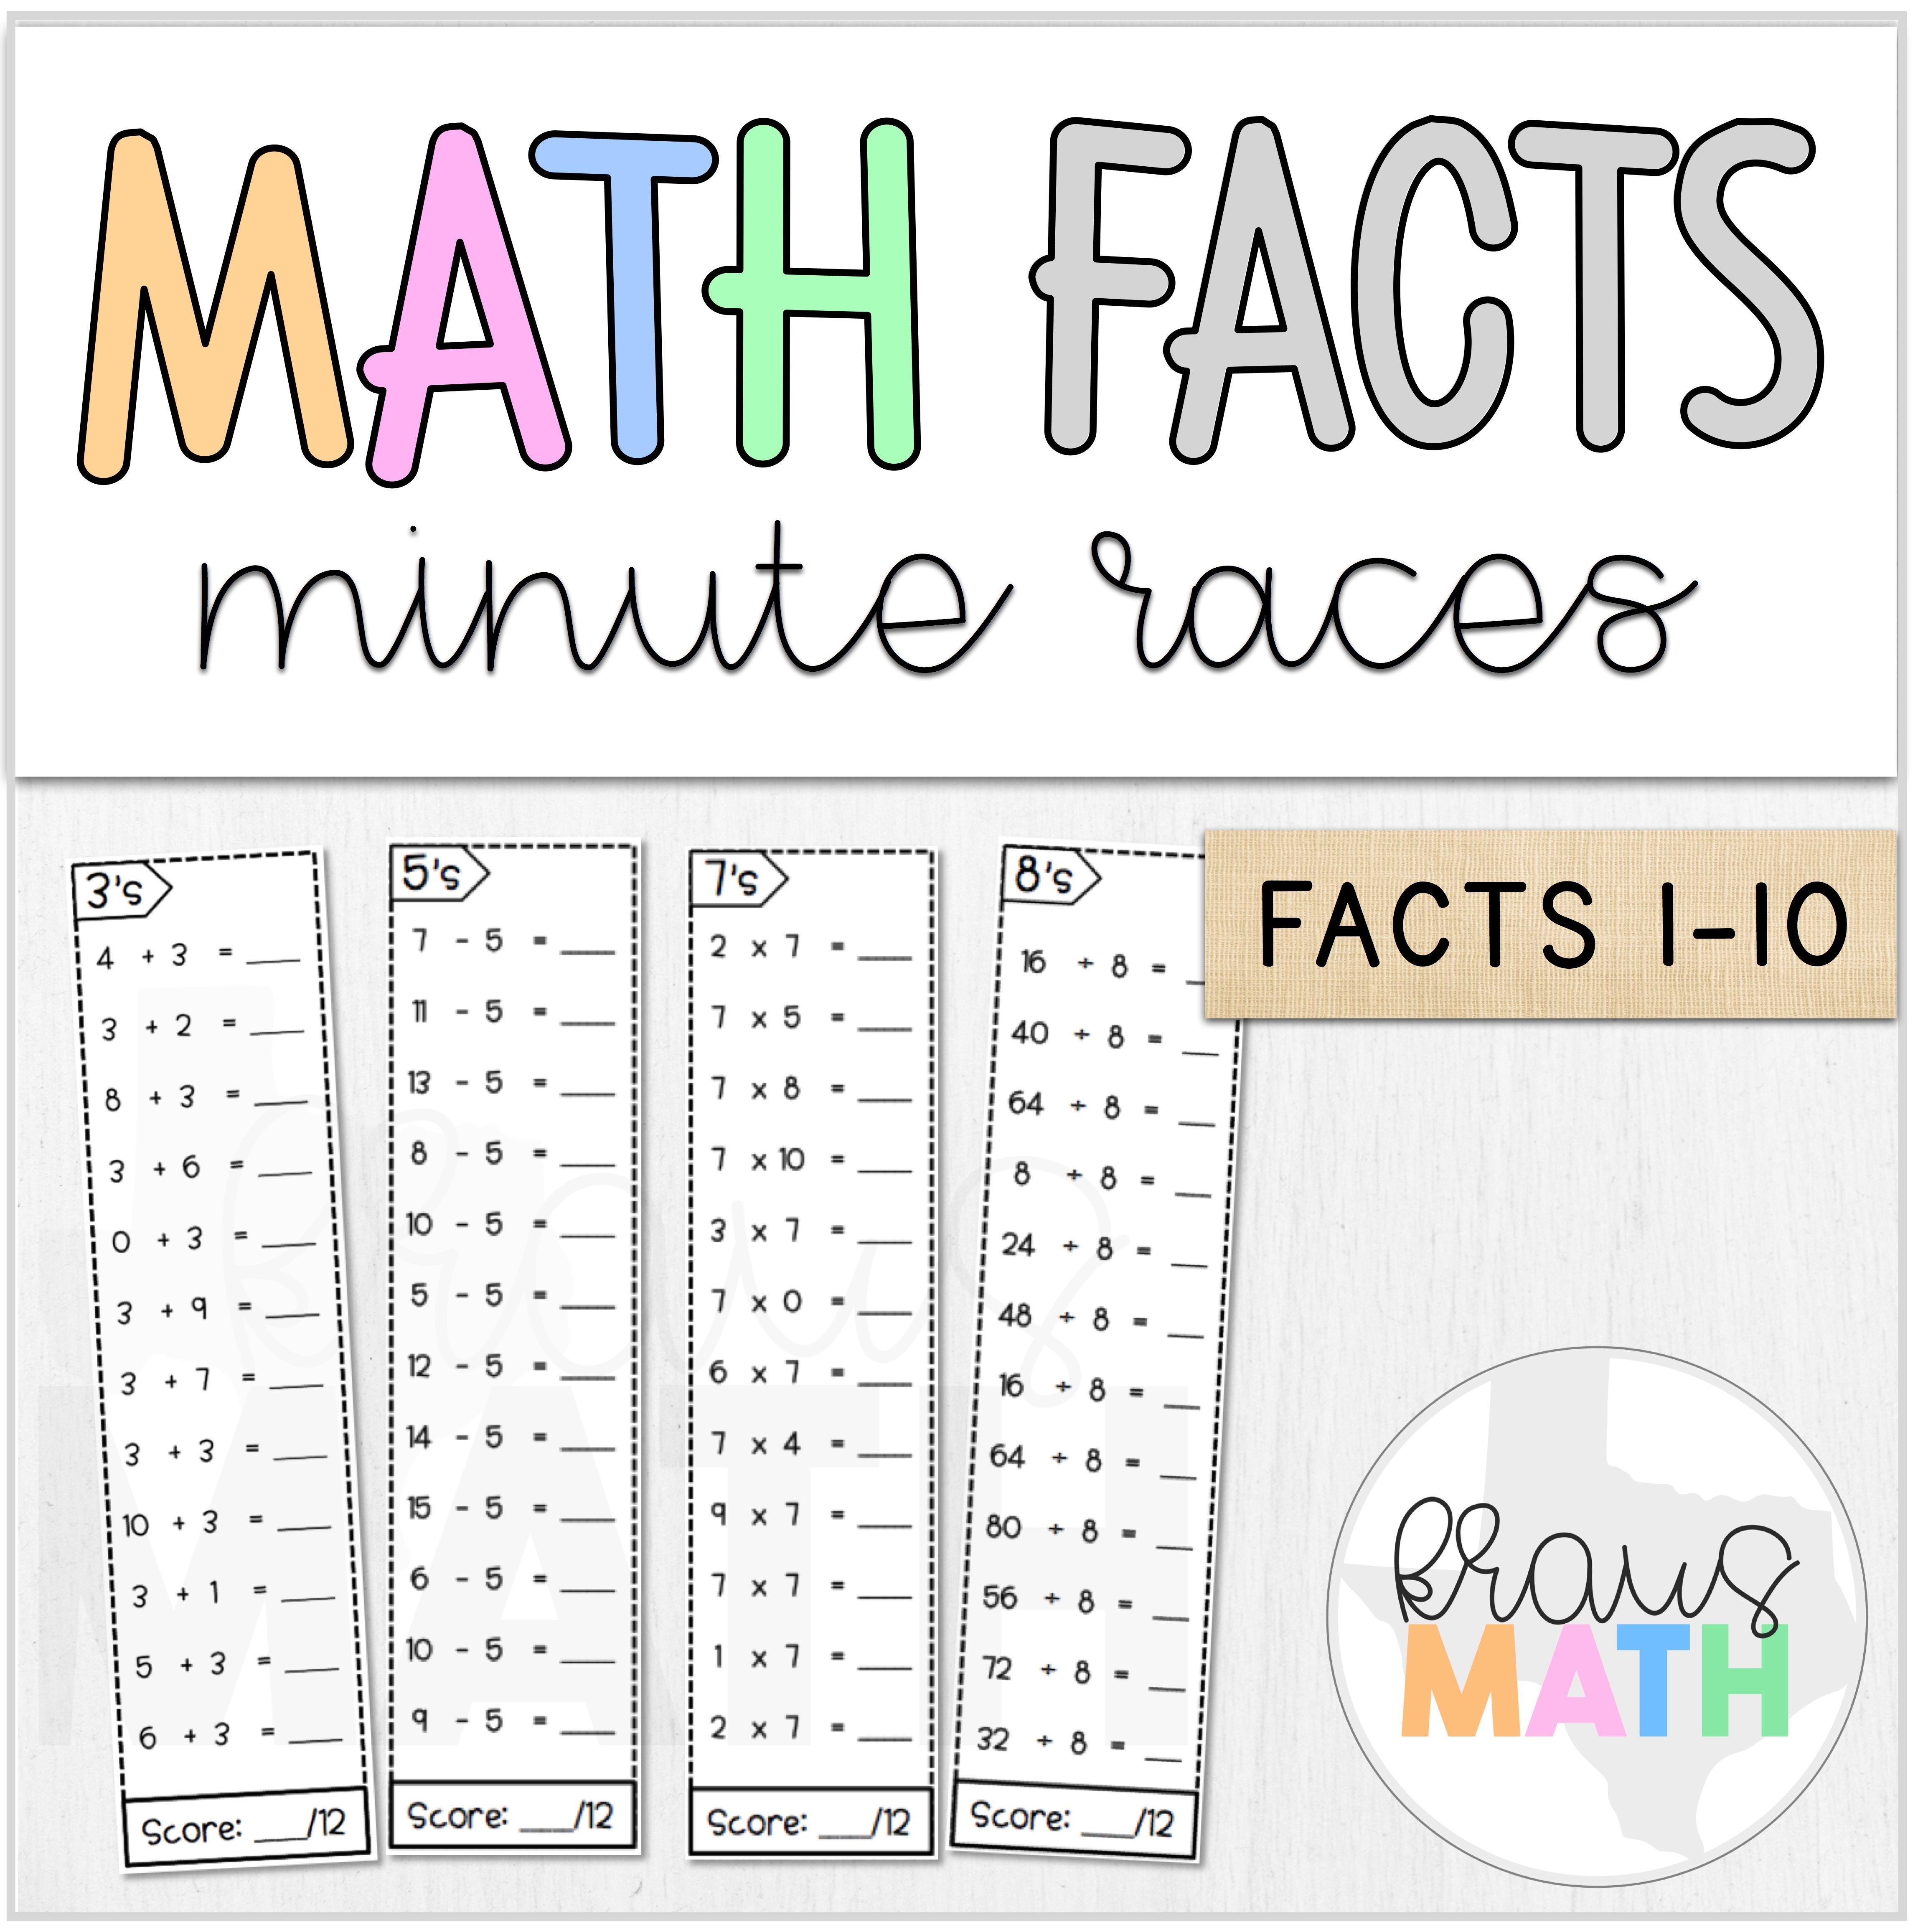 hight resolution of Math Facts Fluency   Minute Races BUNDLE (0-10)   Kraus Math   Math facts